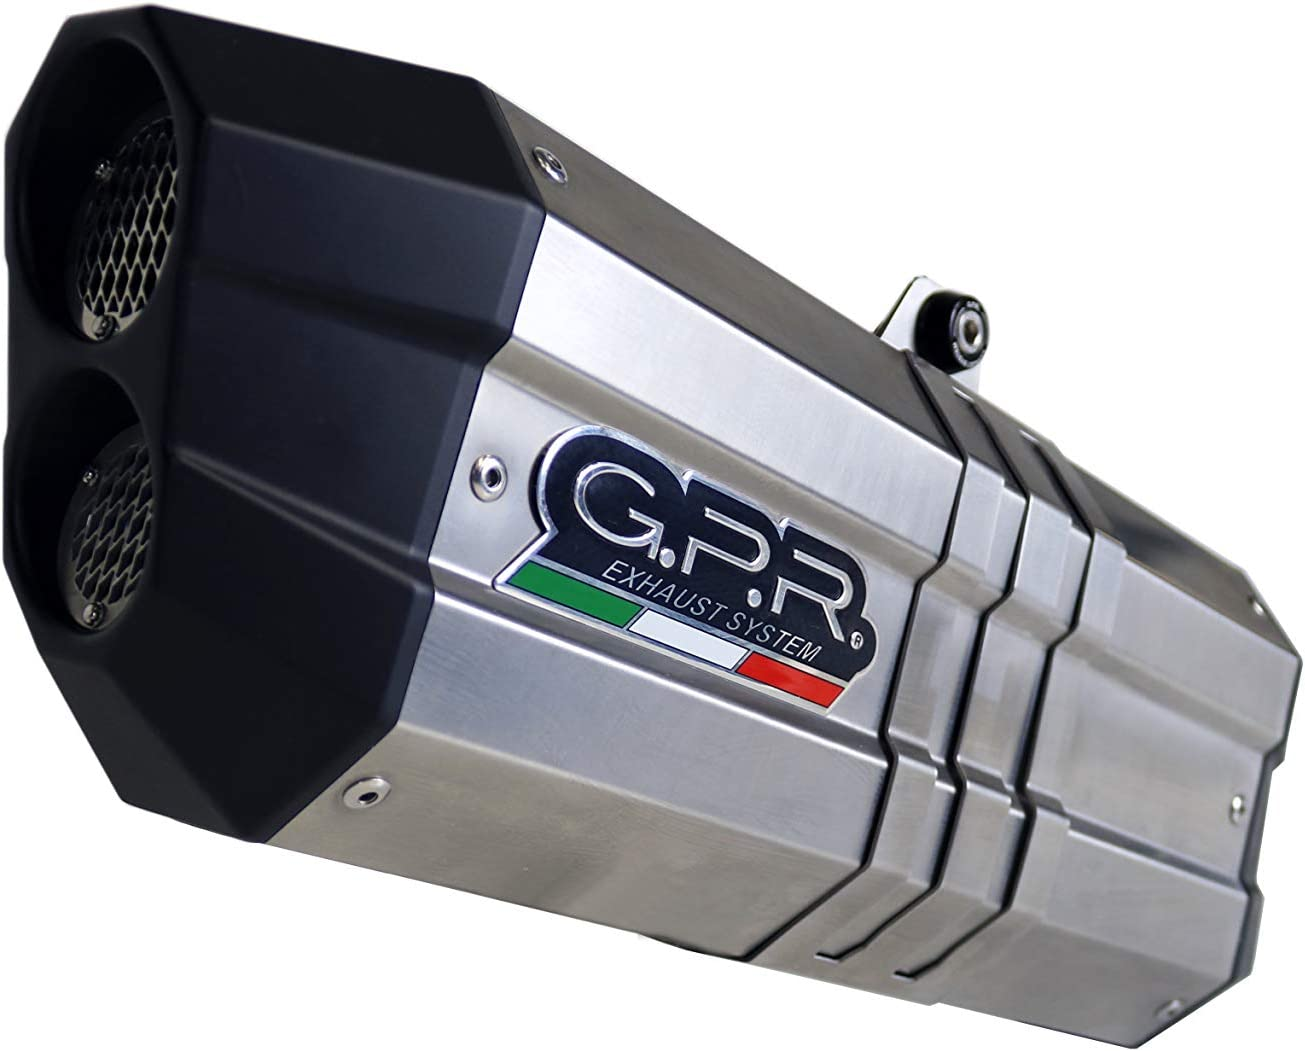 Gpr Exhaust System Kompatibel Mit Aprilia Caponord 1200 2013 17 Auspuff Omolog Mit Raccordo Sonic Inox Auto